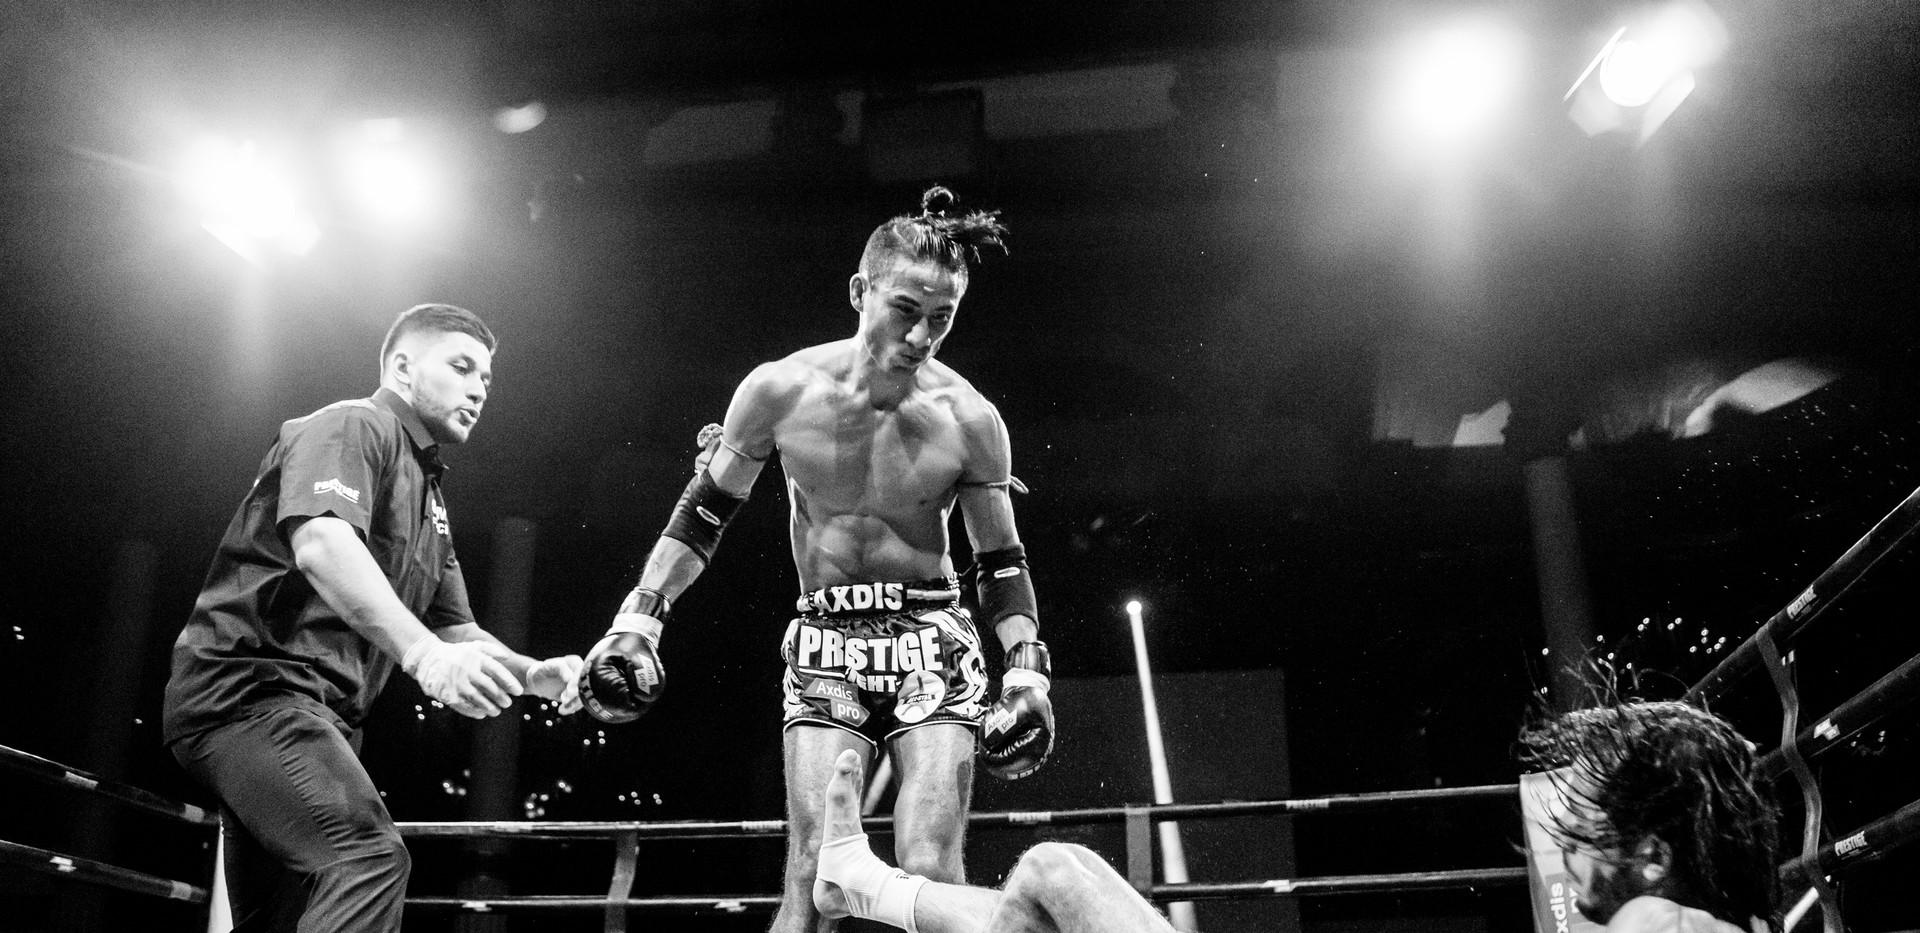 Boxe Thai - Salle Wagram (Paris) - 2016